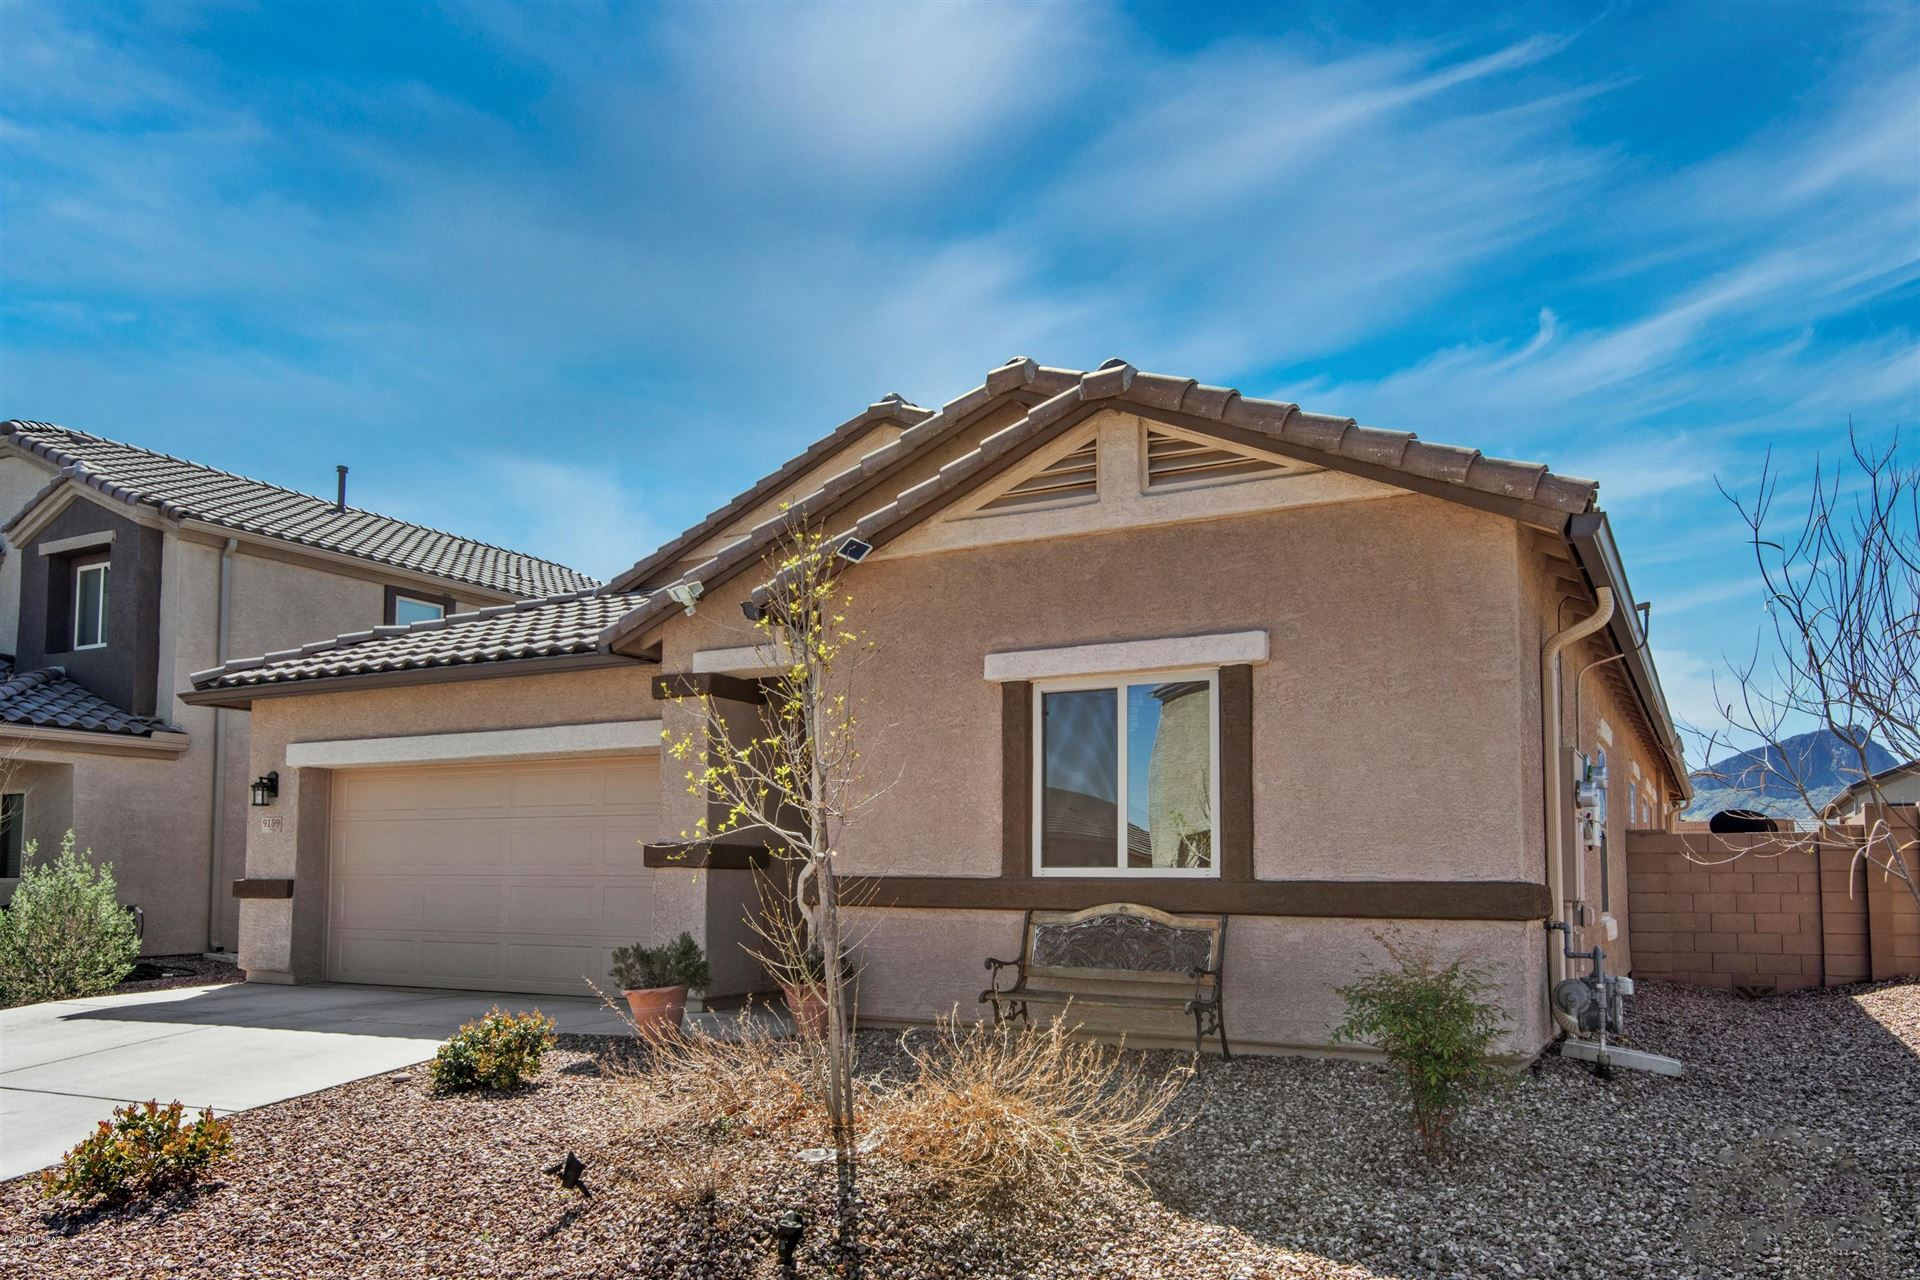 9159 W Blue Saguaro Street, Marana, AZ 85653 - #: 22008252